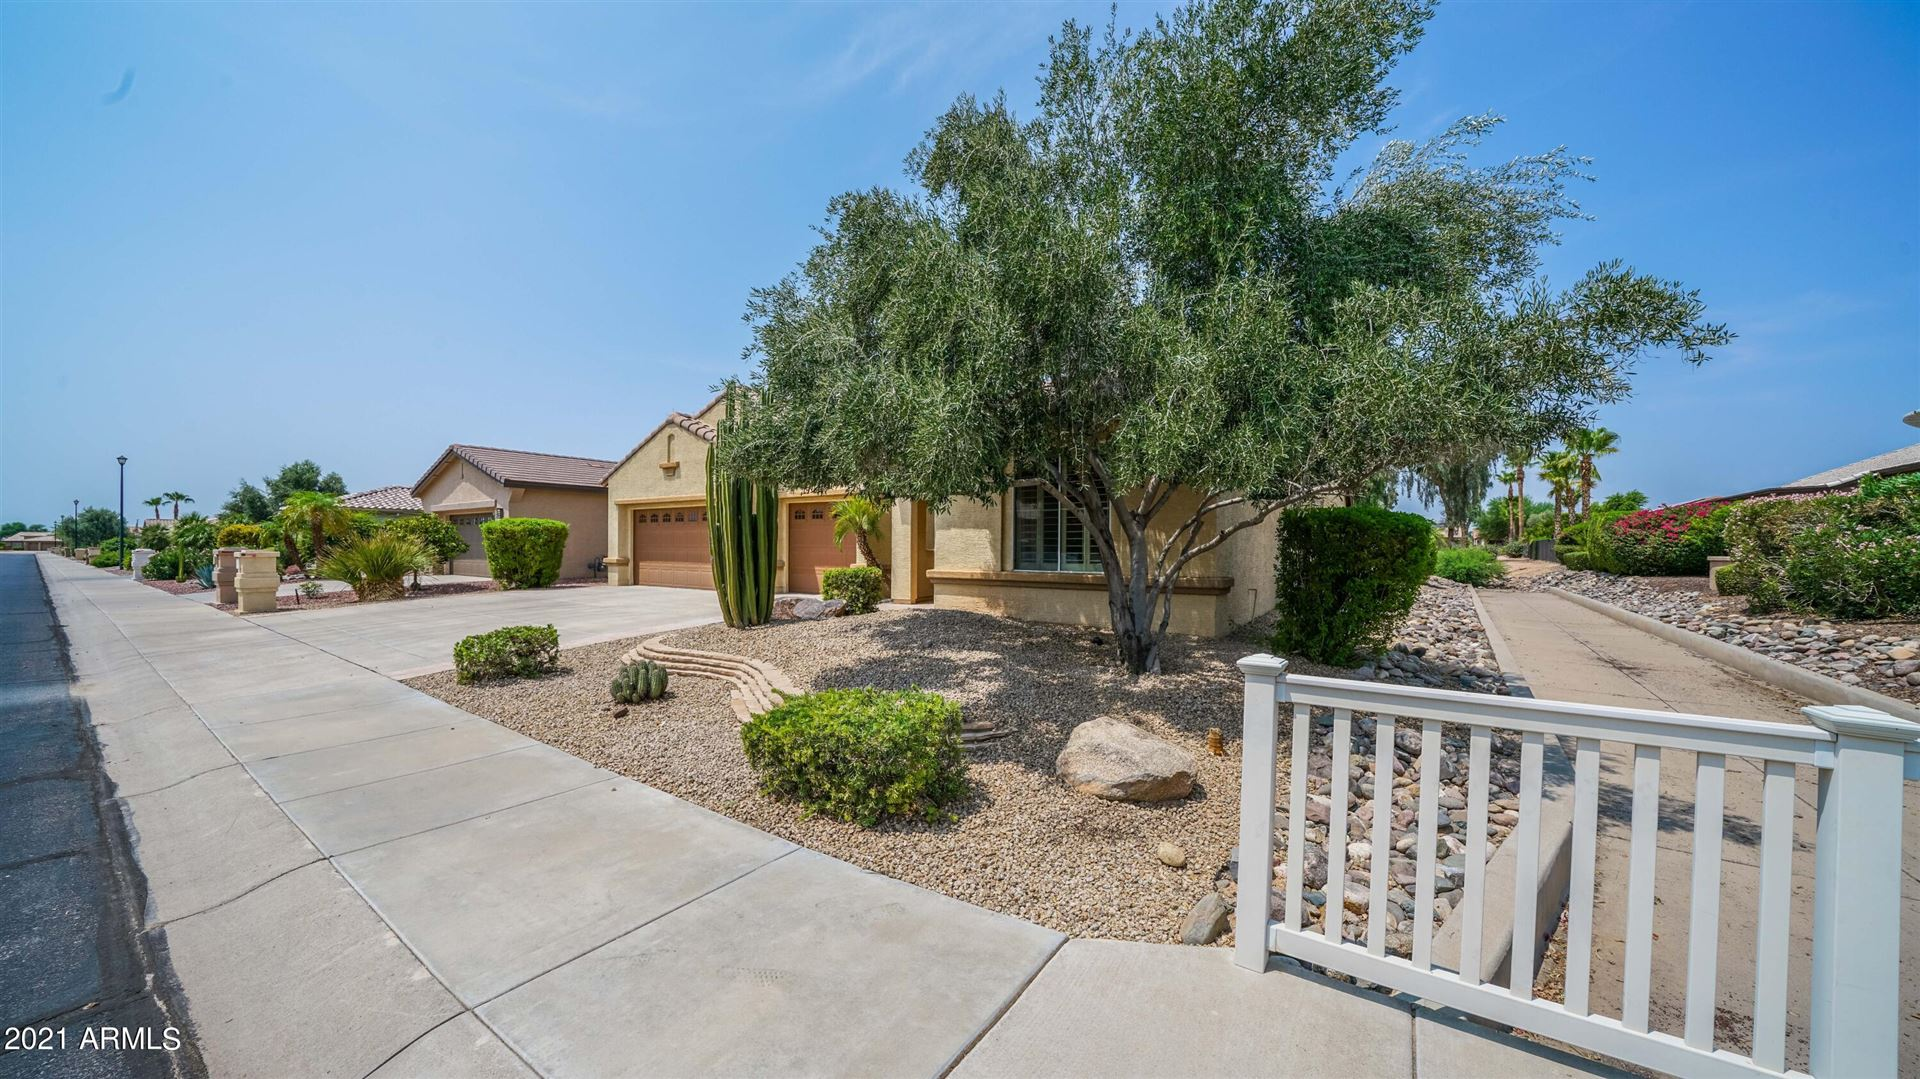 Photo of 3754 N 162ND Avenue, Goodyear, AZ 85395 (MLS # 6267432)